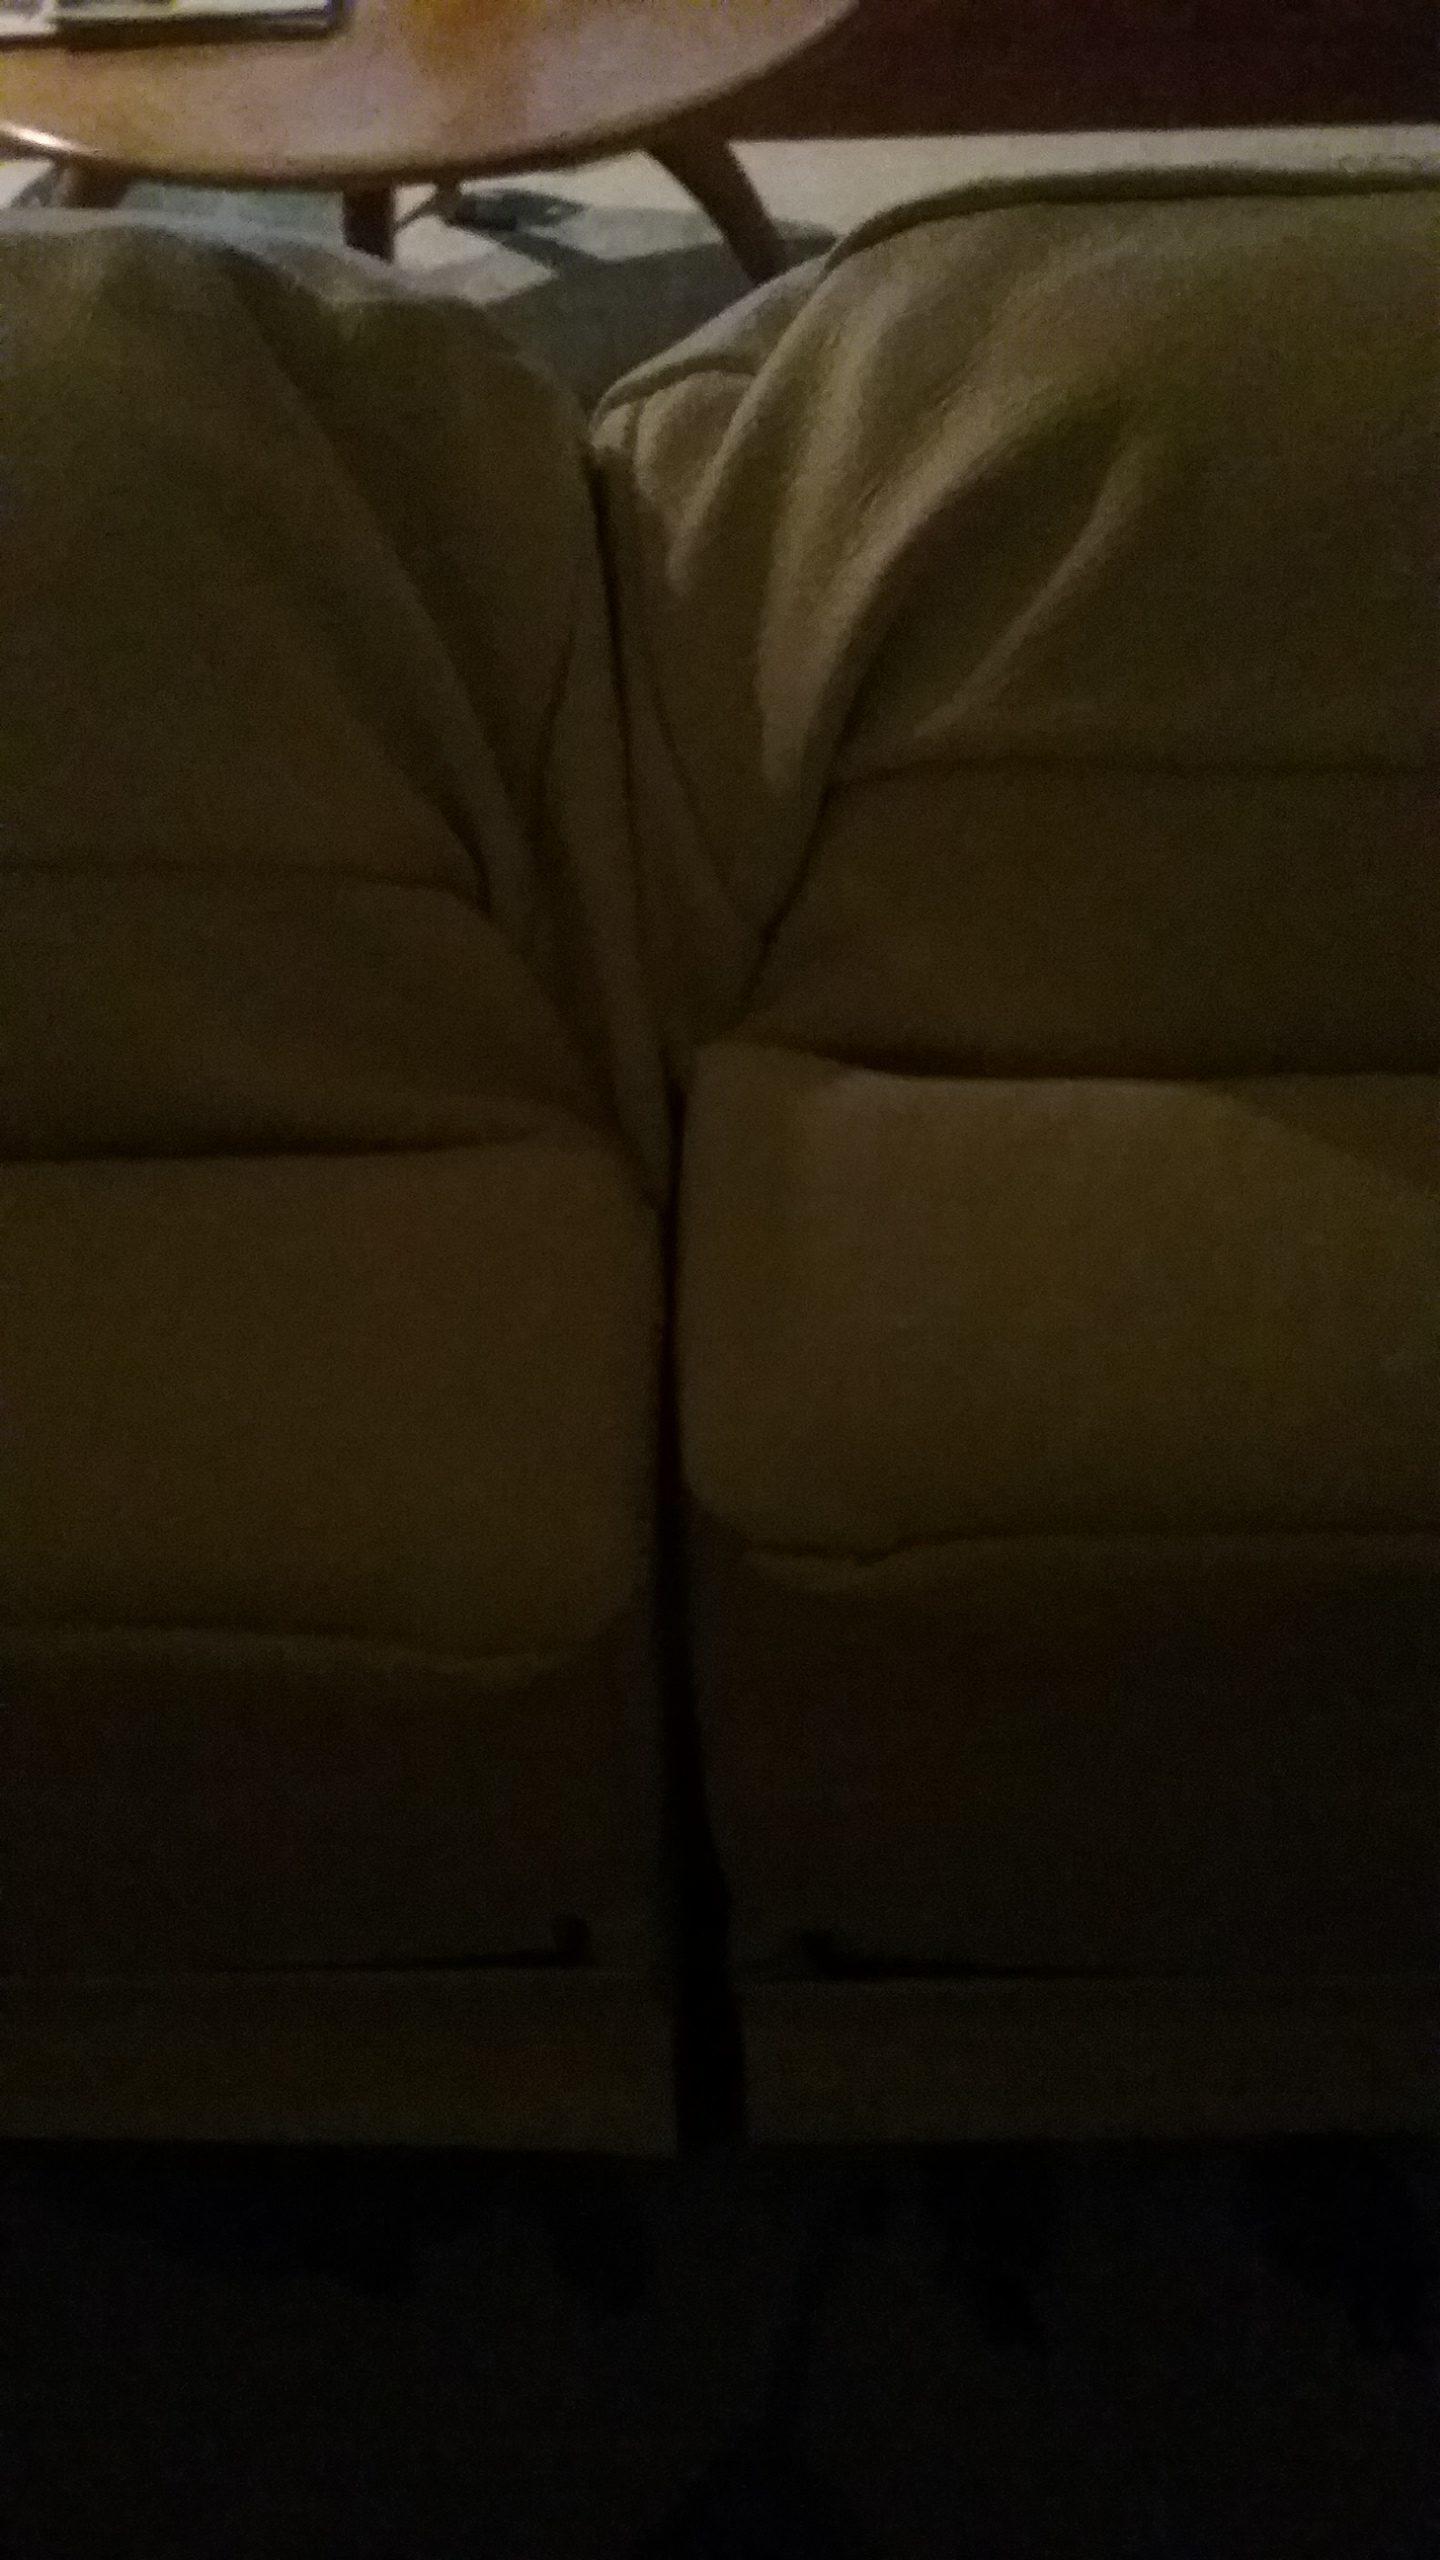 La Z Boy Bedroom Furniture Top 4937 Reviews And Complaints About La Z Boy Furniture Galleries